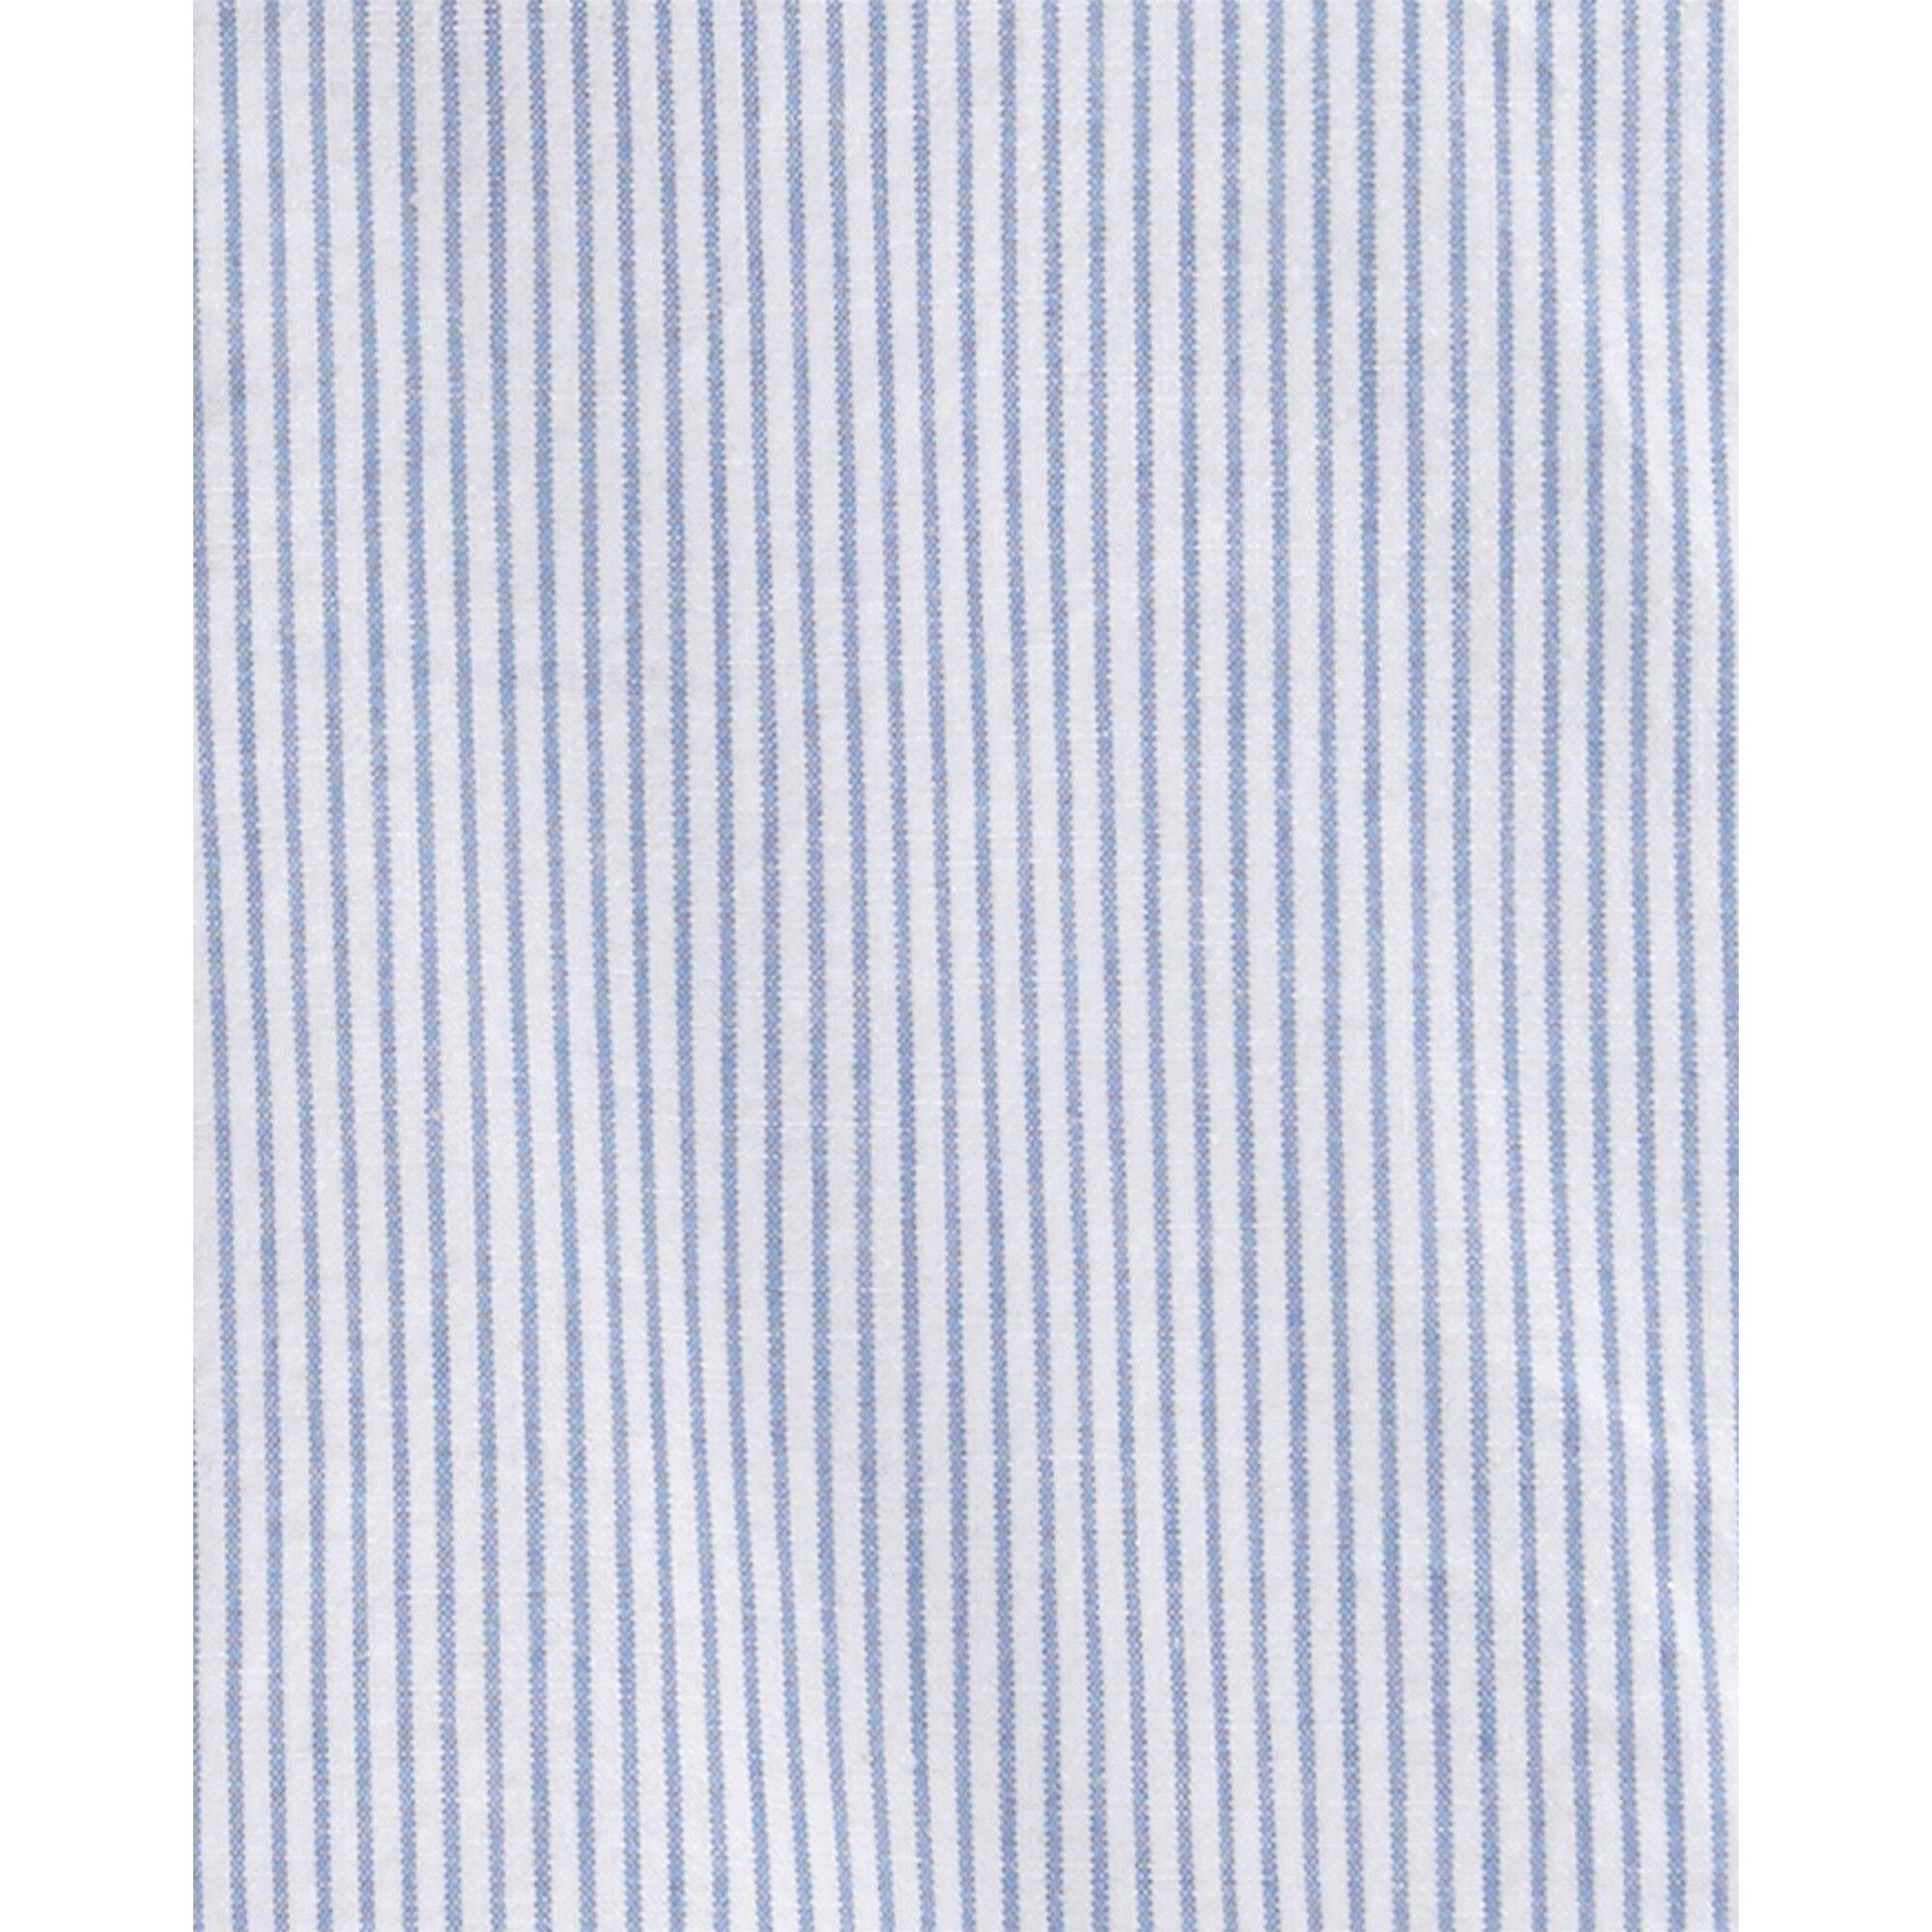 carter-s-2-tlg-set-hemd-und-shorts-wale